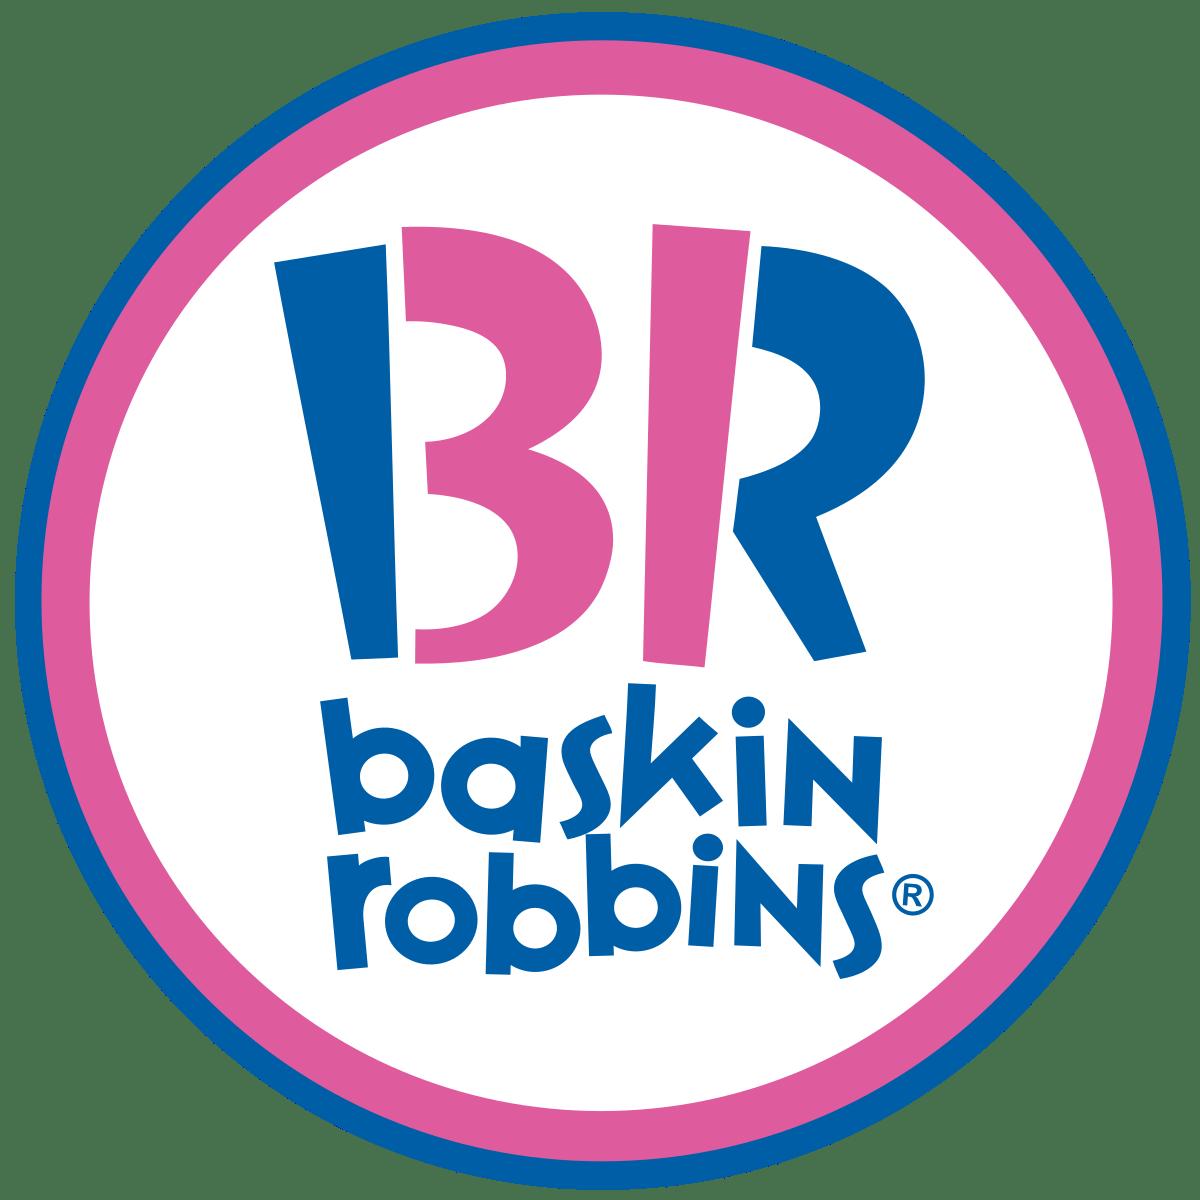 Restaurant logo - Baskin Robbins